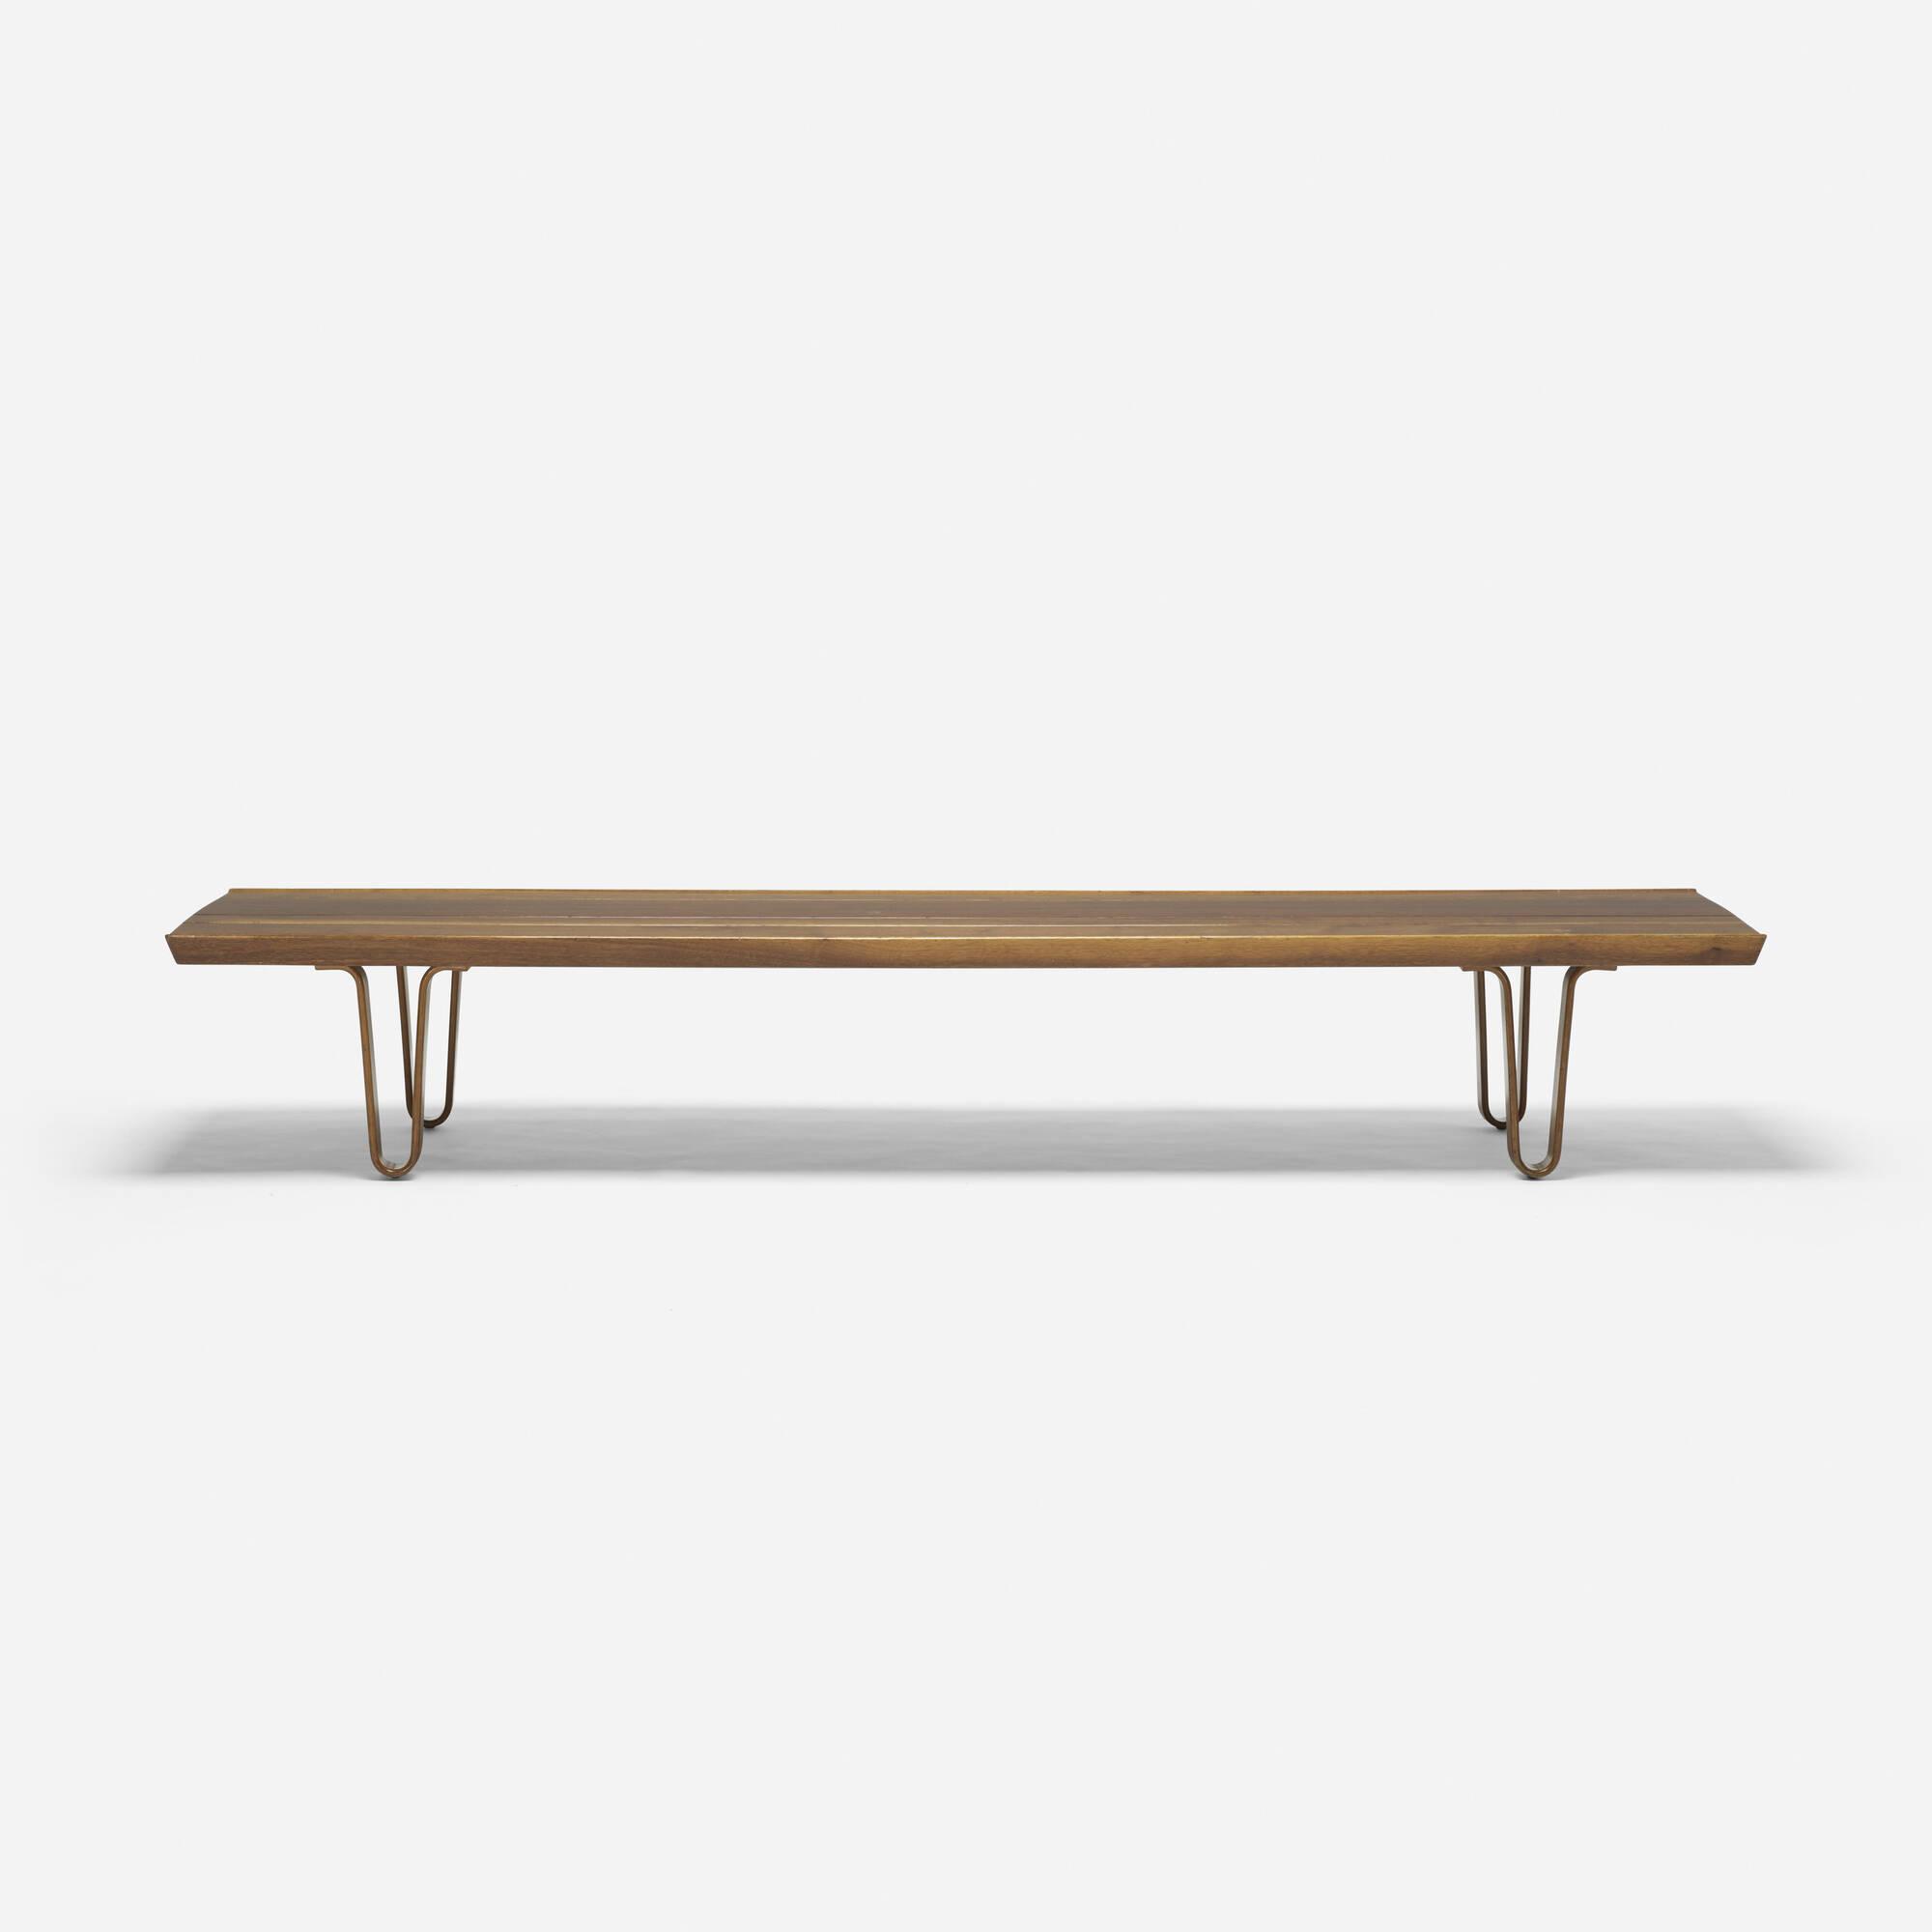 356: Edward Wormley / Long John coffee table (2 of 3)